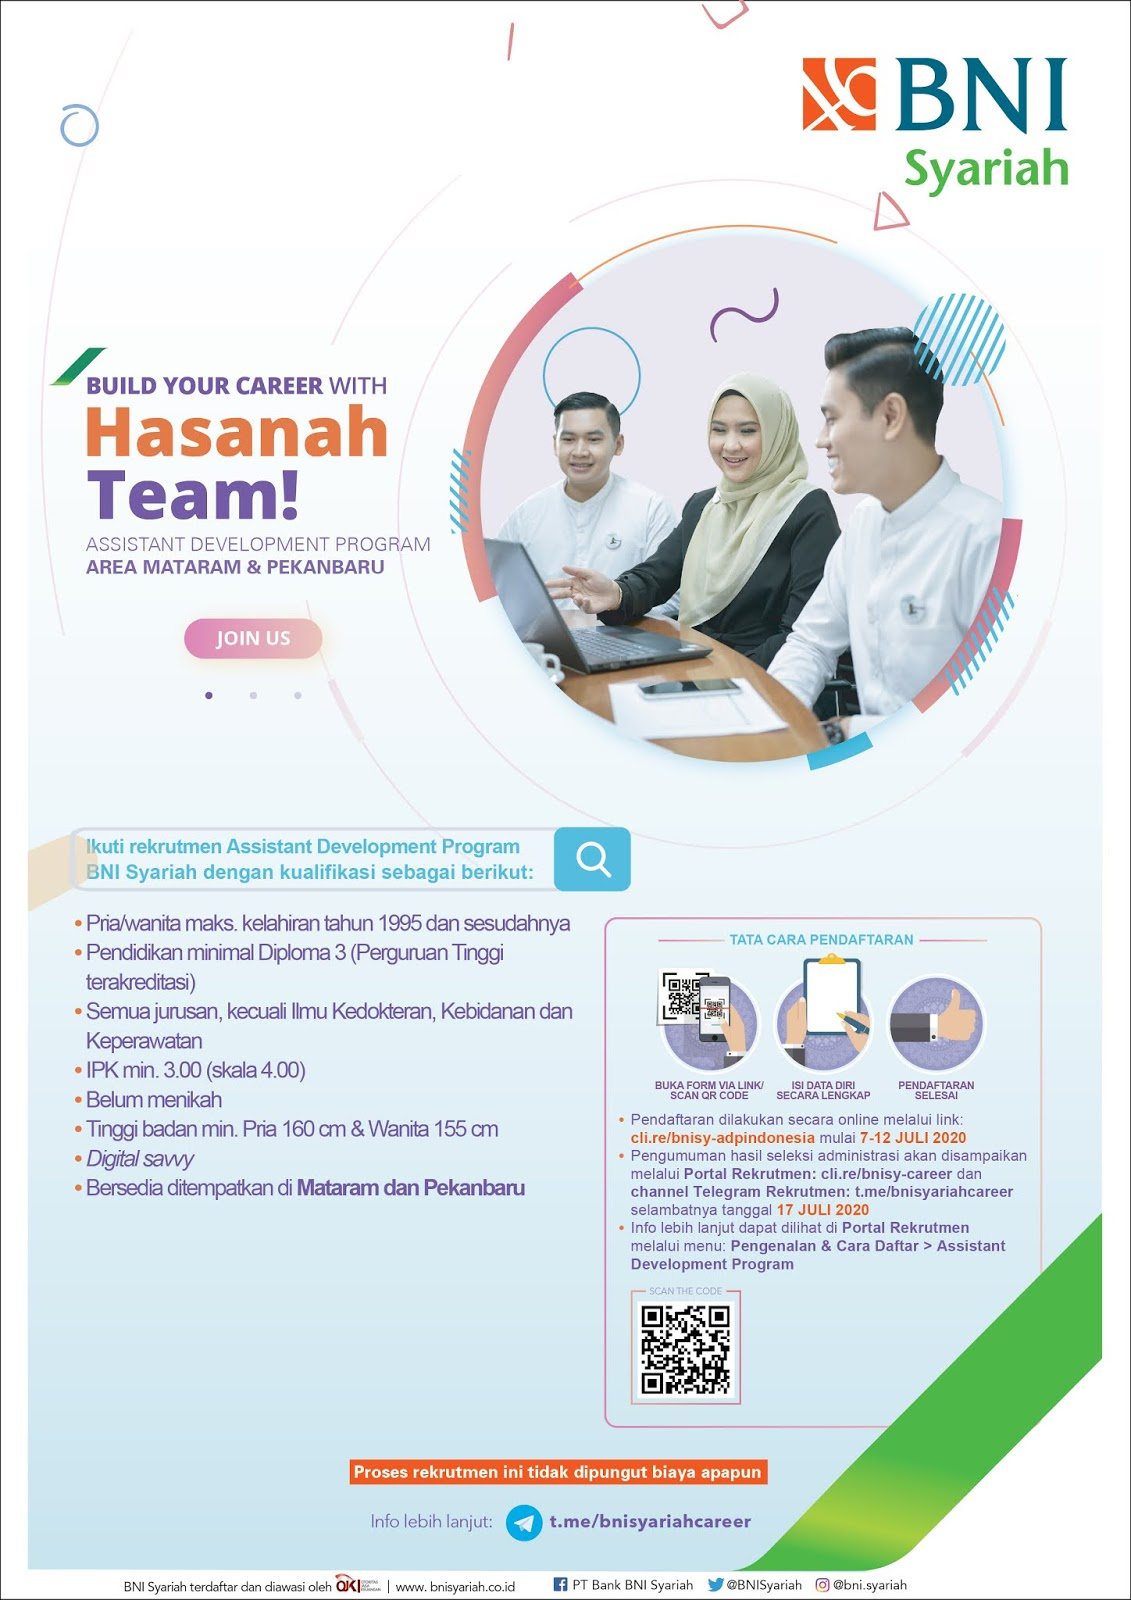 Lowongan Kerja Bank Bni Syariah D3 Semua Jurusan Juli 2020 Rekrutmen Lowongan Kerja Bulan Juni 2021